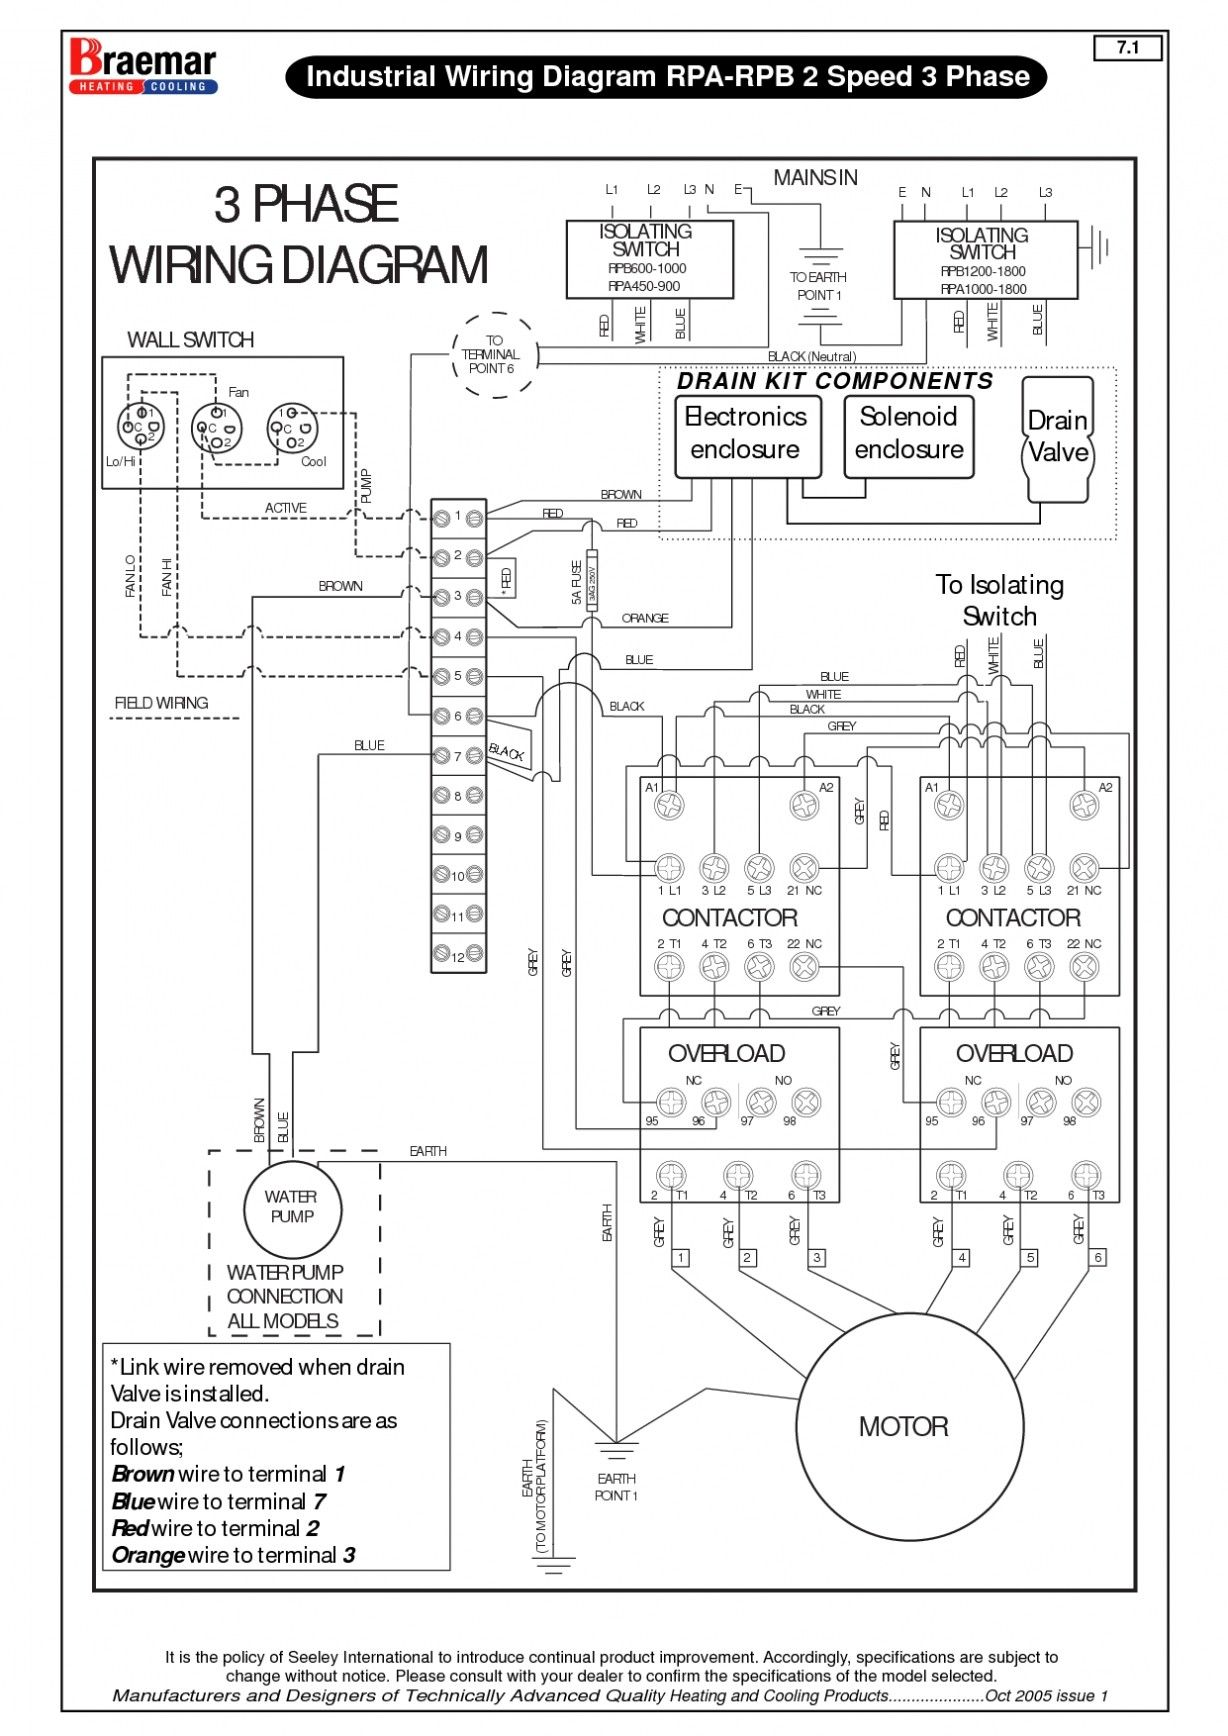 Unique Motor Terminal Connection Diagram #diagram #wiringdiagram  #diagramming #Diagramm #visuals #visualisati… | Diagram, Christmas village  display, Village displayPinterest